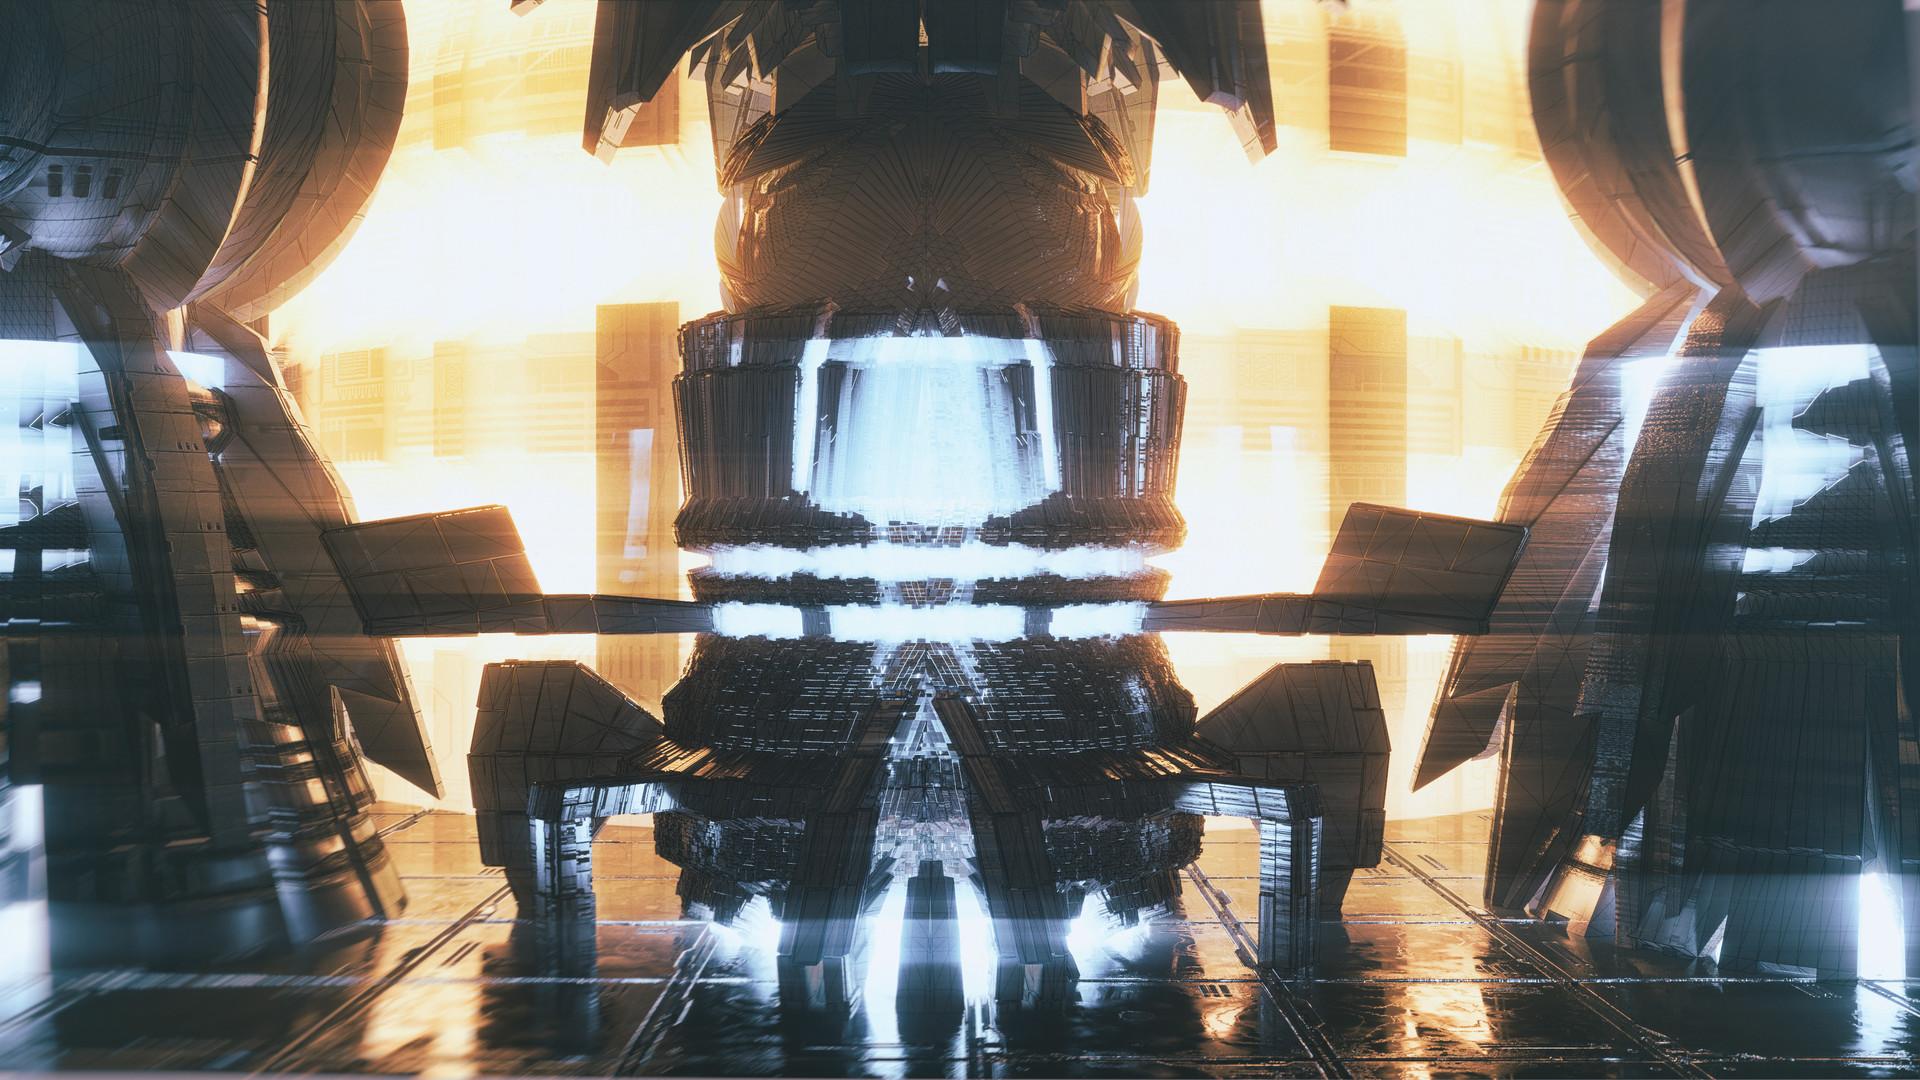 Kresimir jelusic robob3ar 244 130616